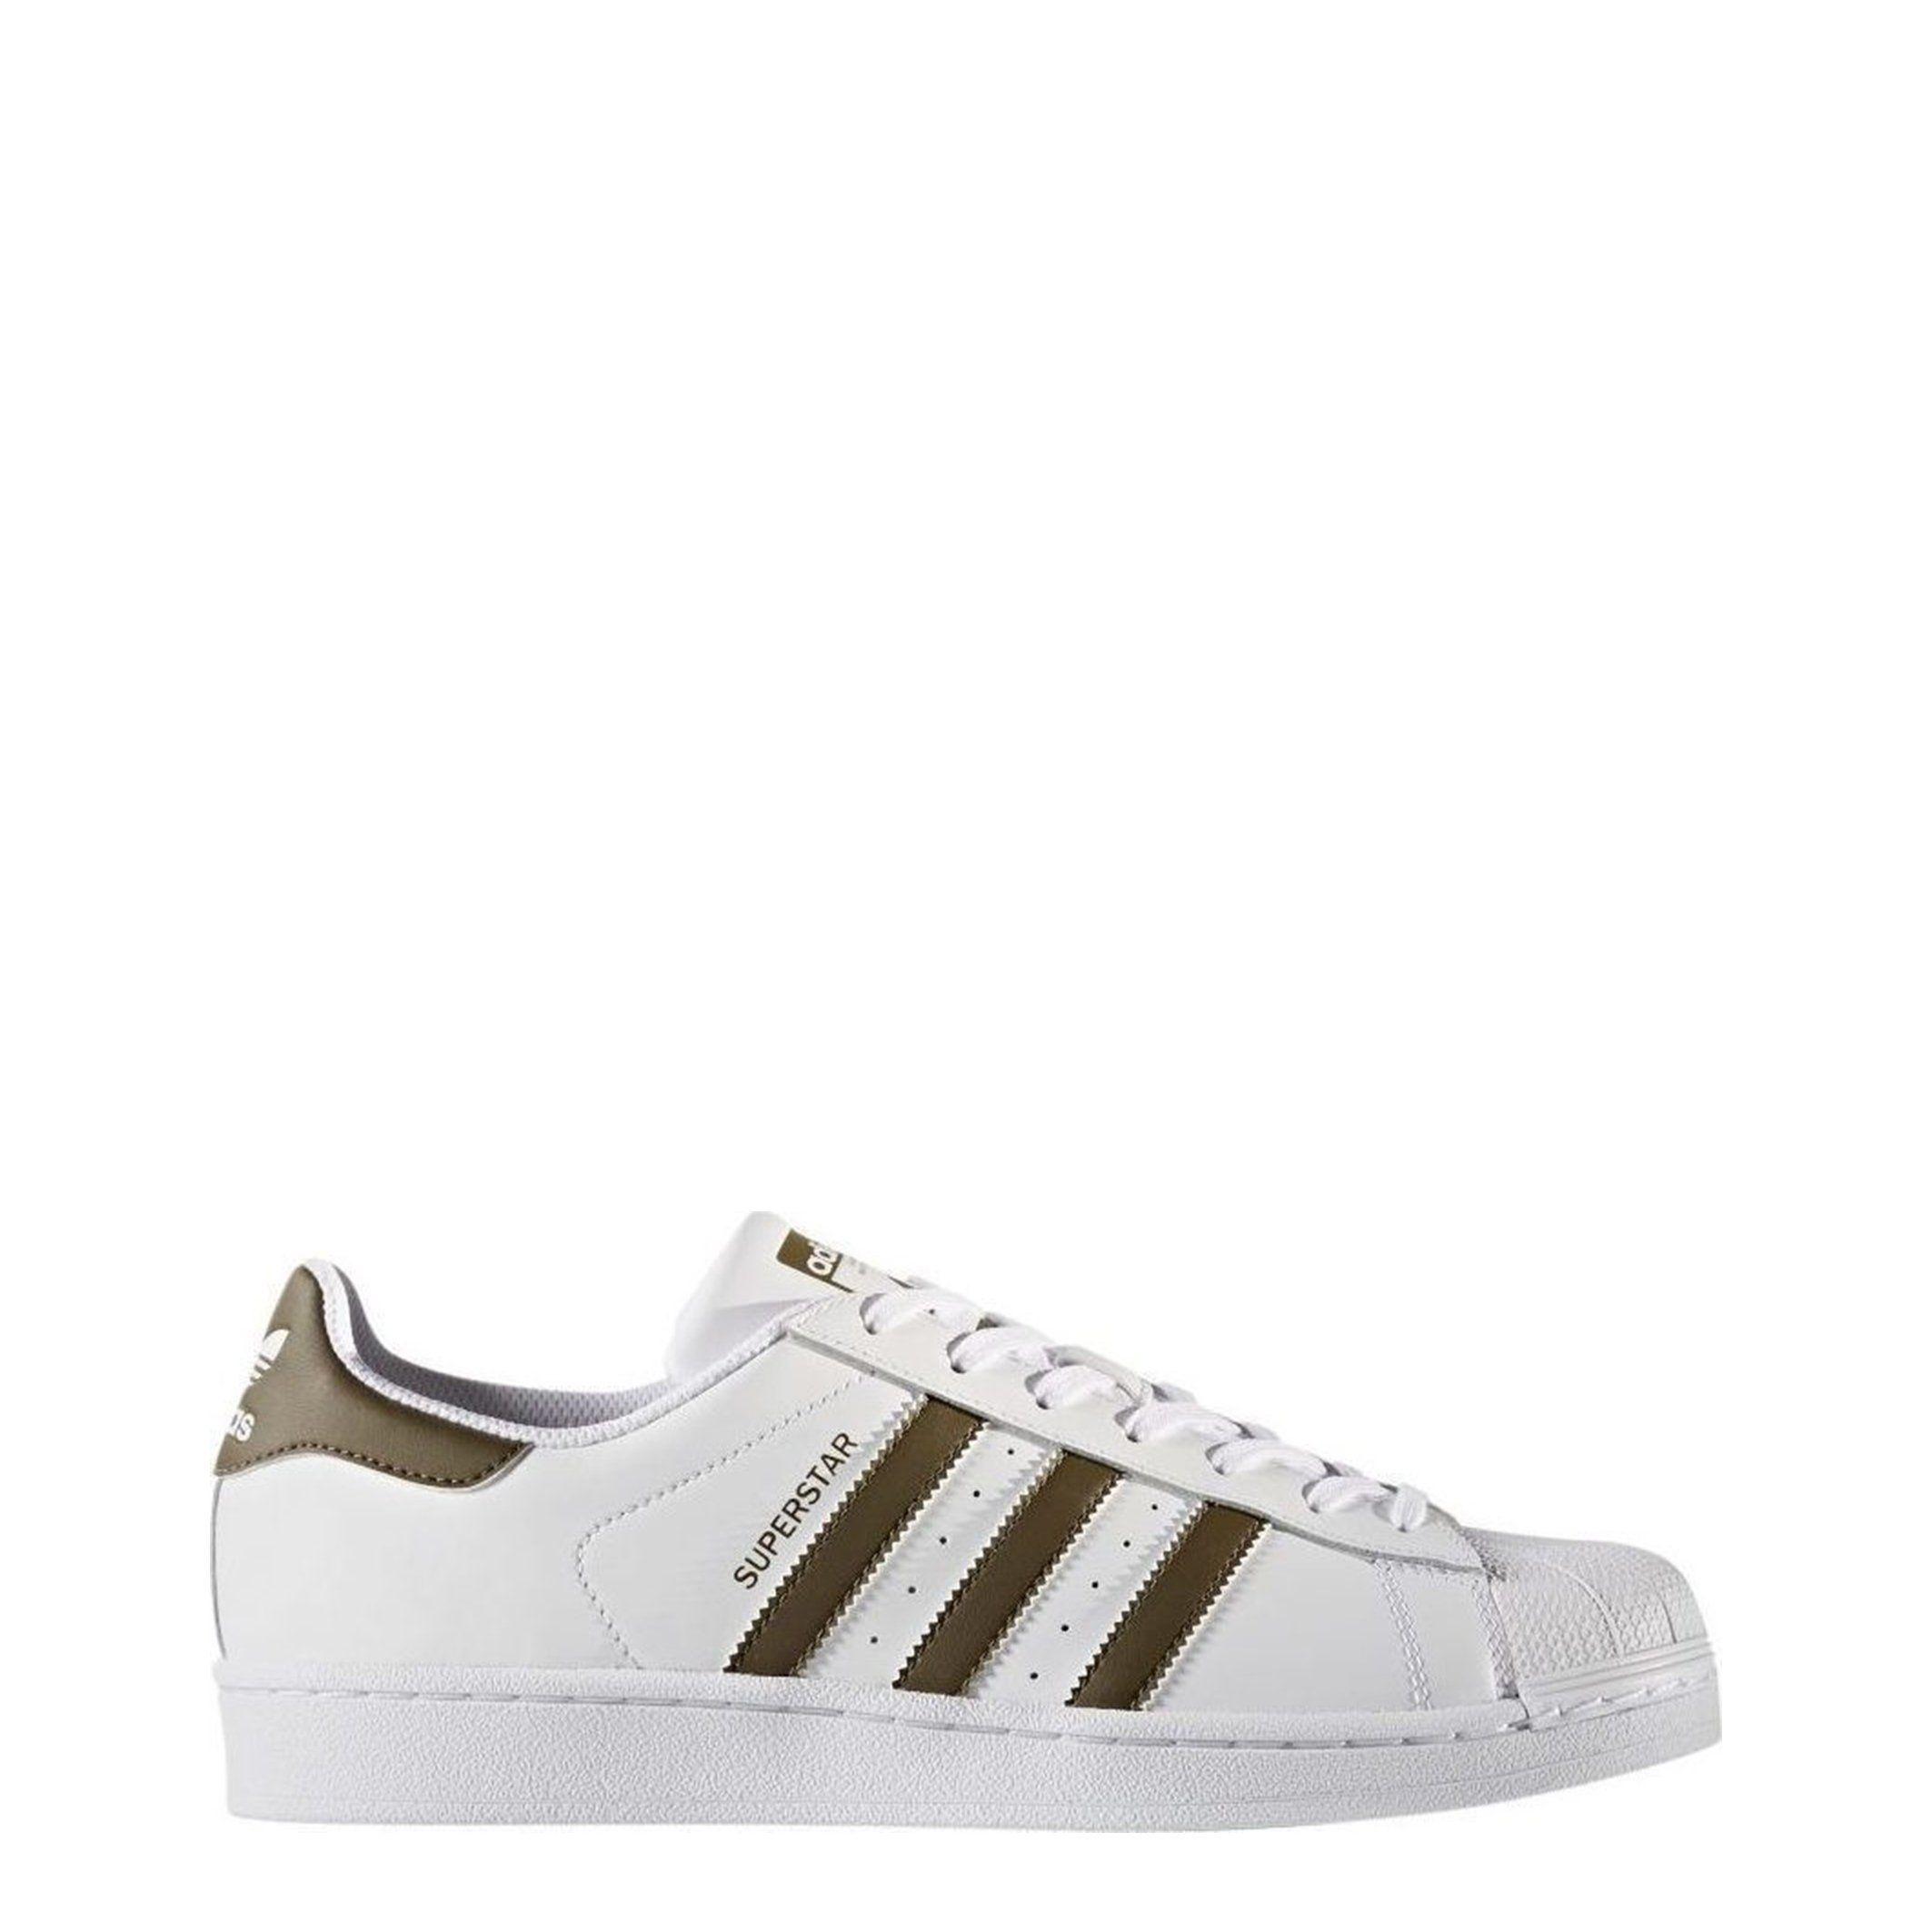 d3ecc35c73646 Adidas Superstar